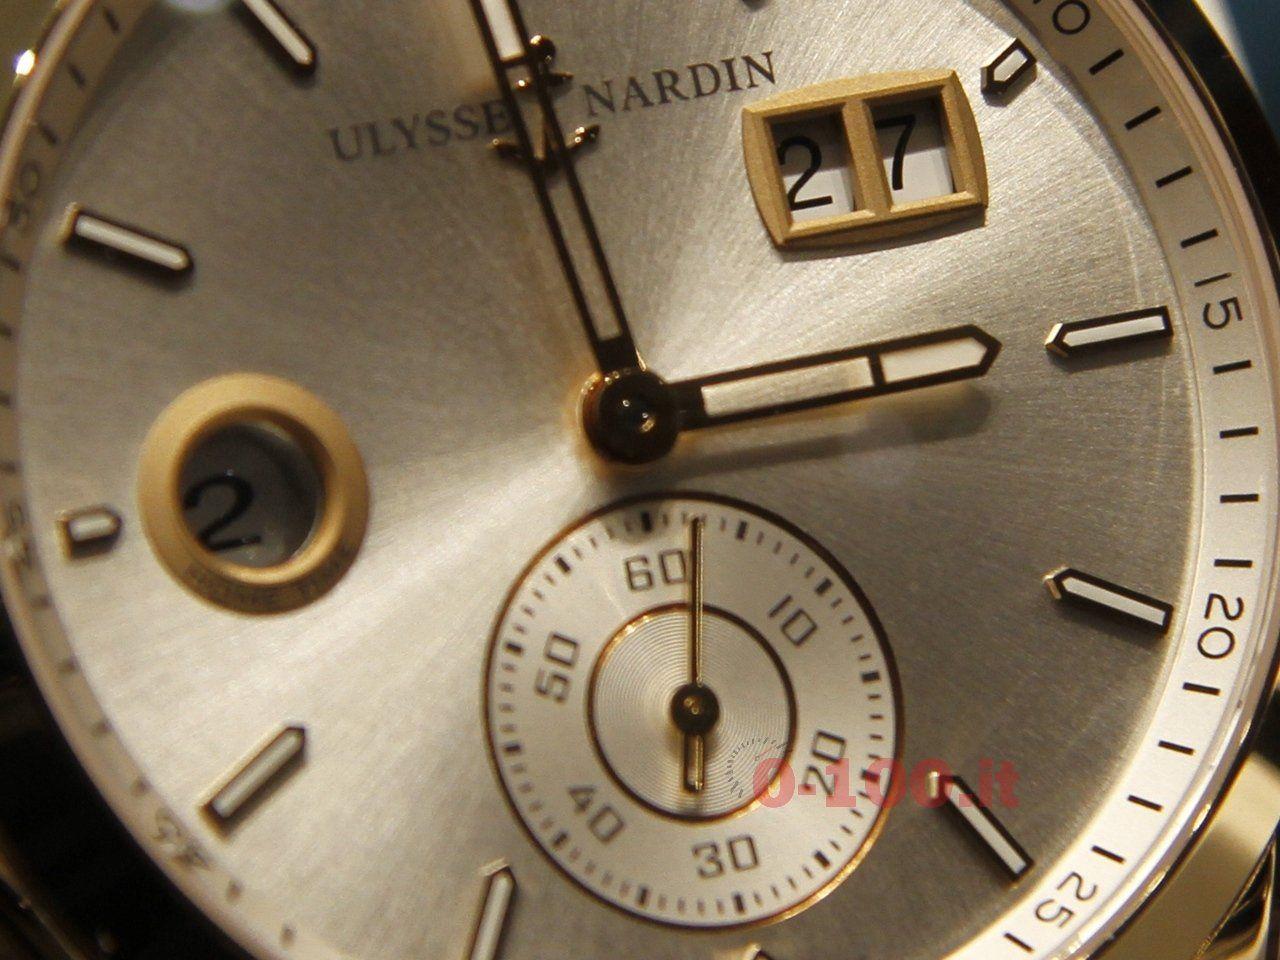 baselworld-2014-Ulysse Nardin Dual Time Manufacture_Ref_3346-126-91_0-1007